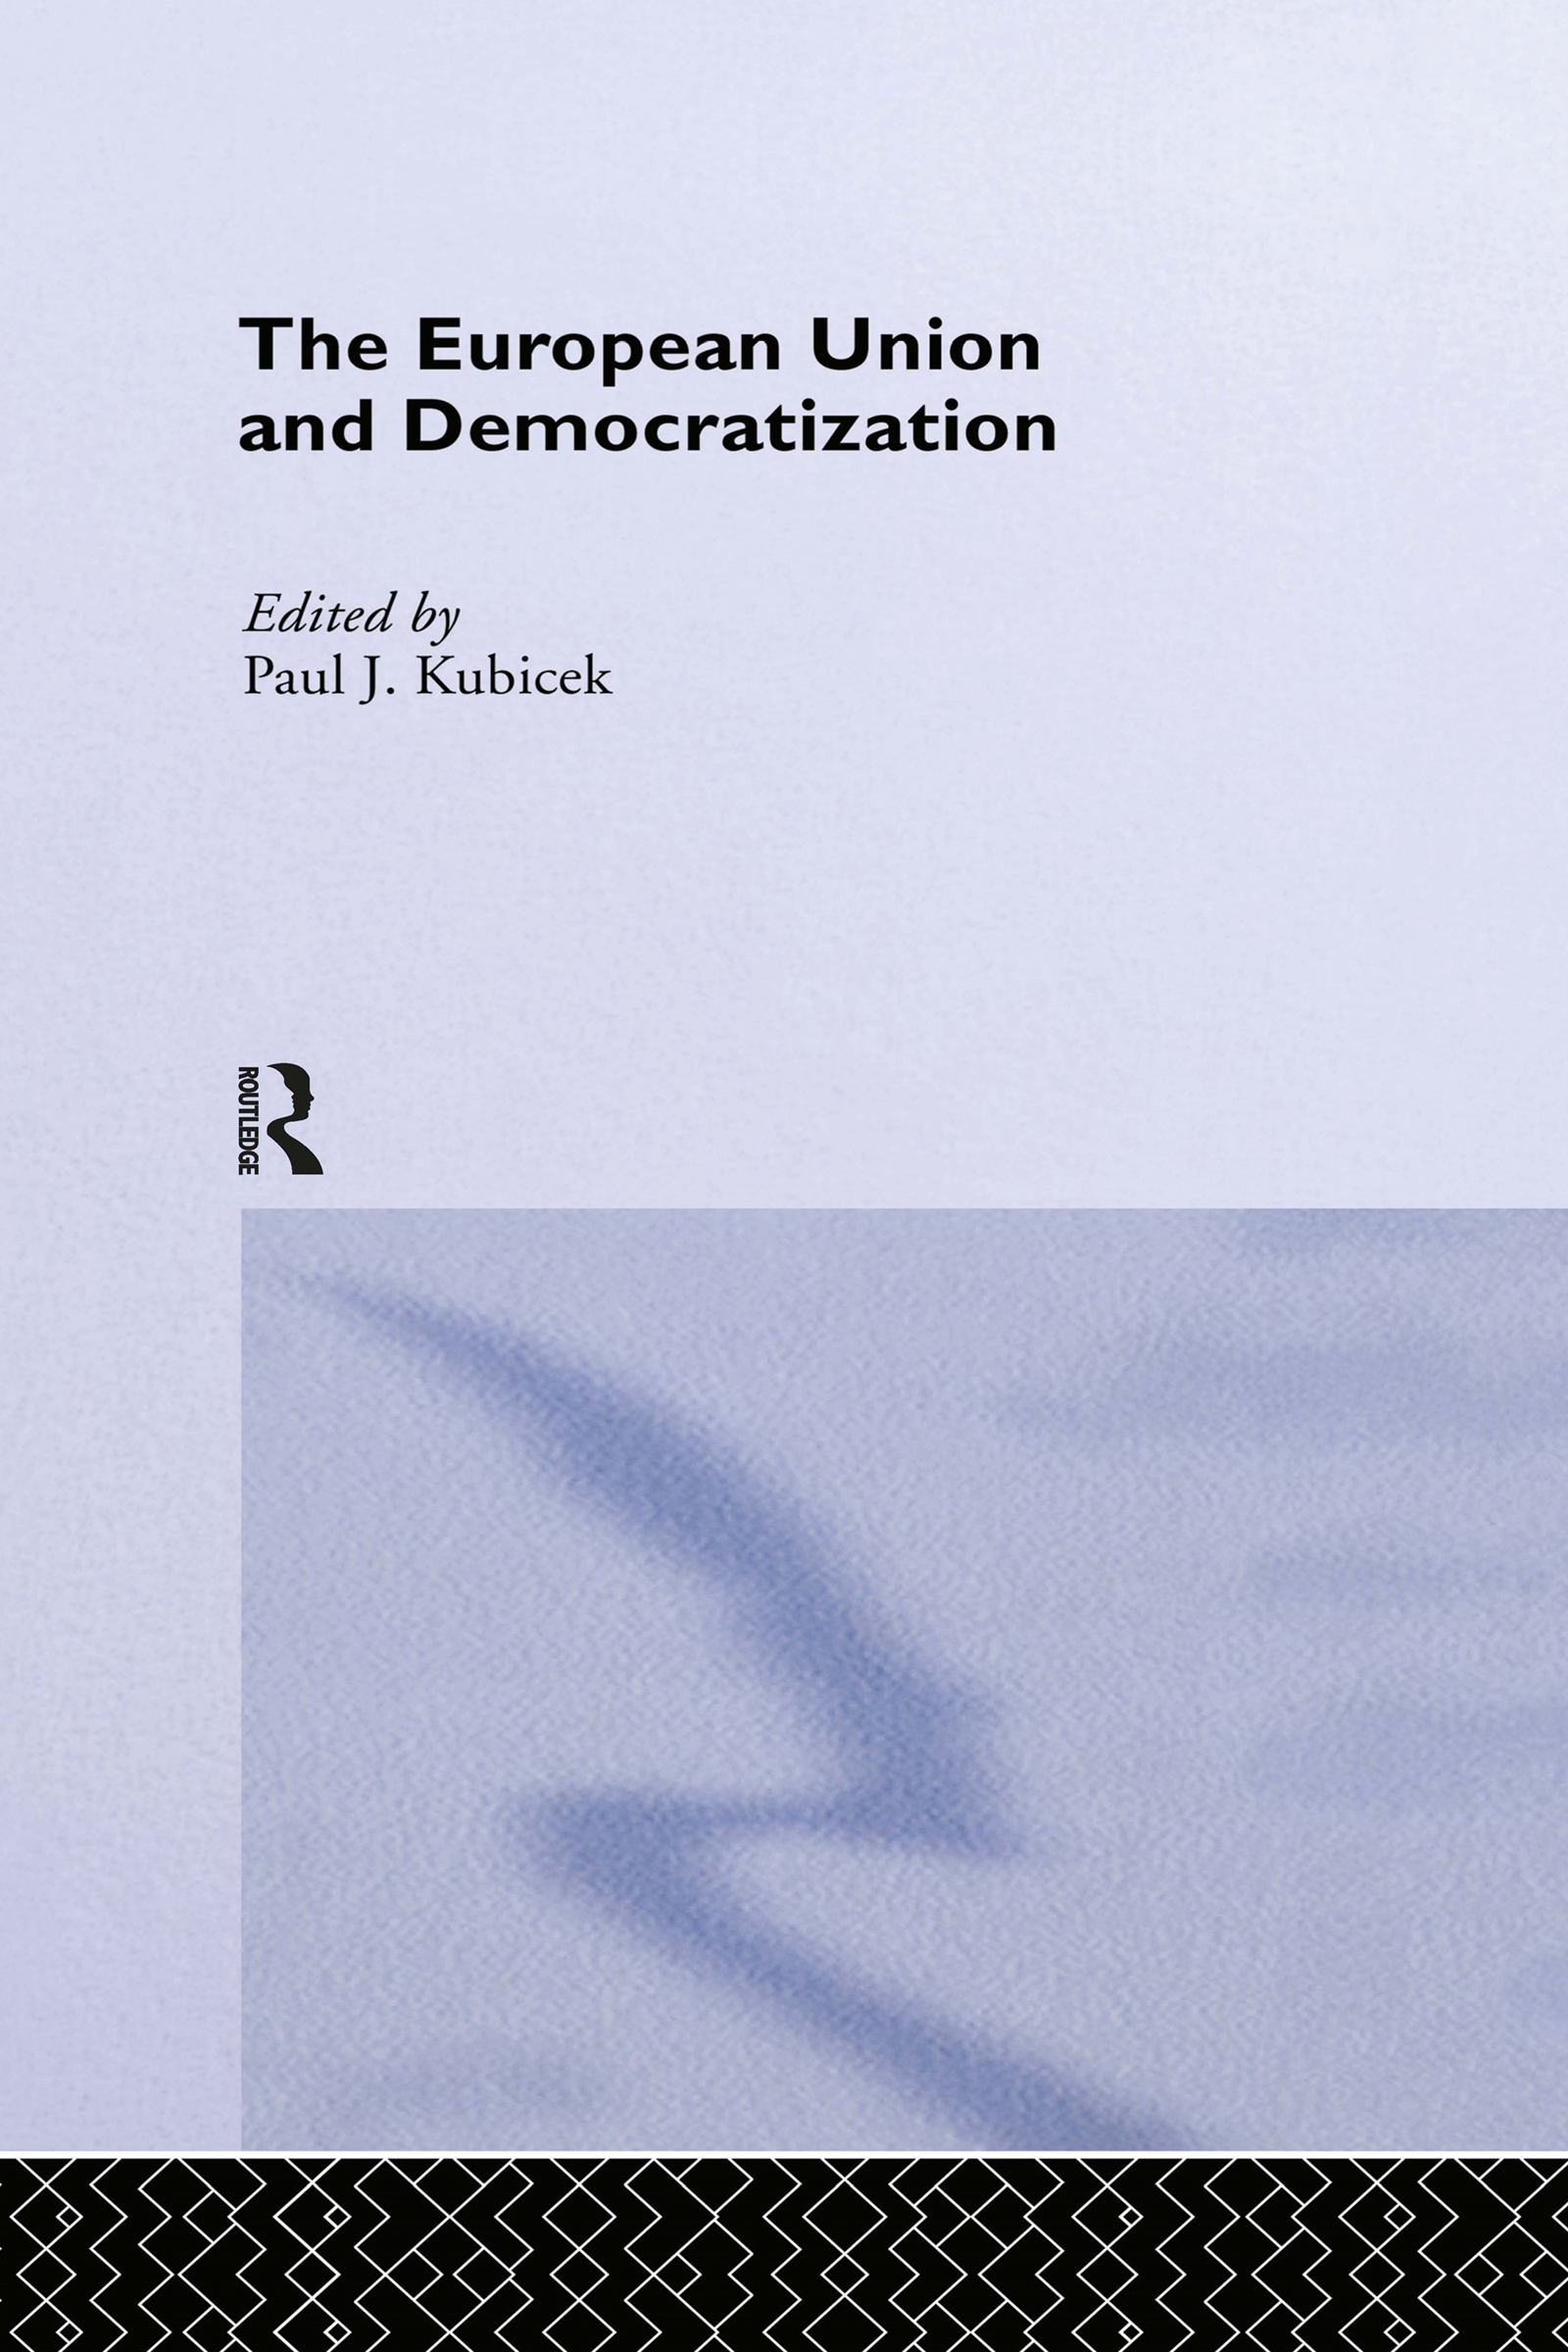 The European Union & Democratization